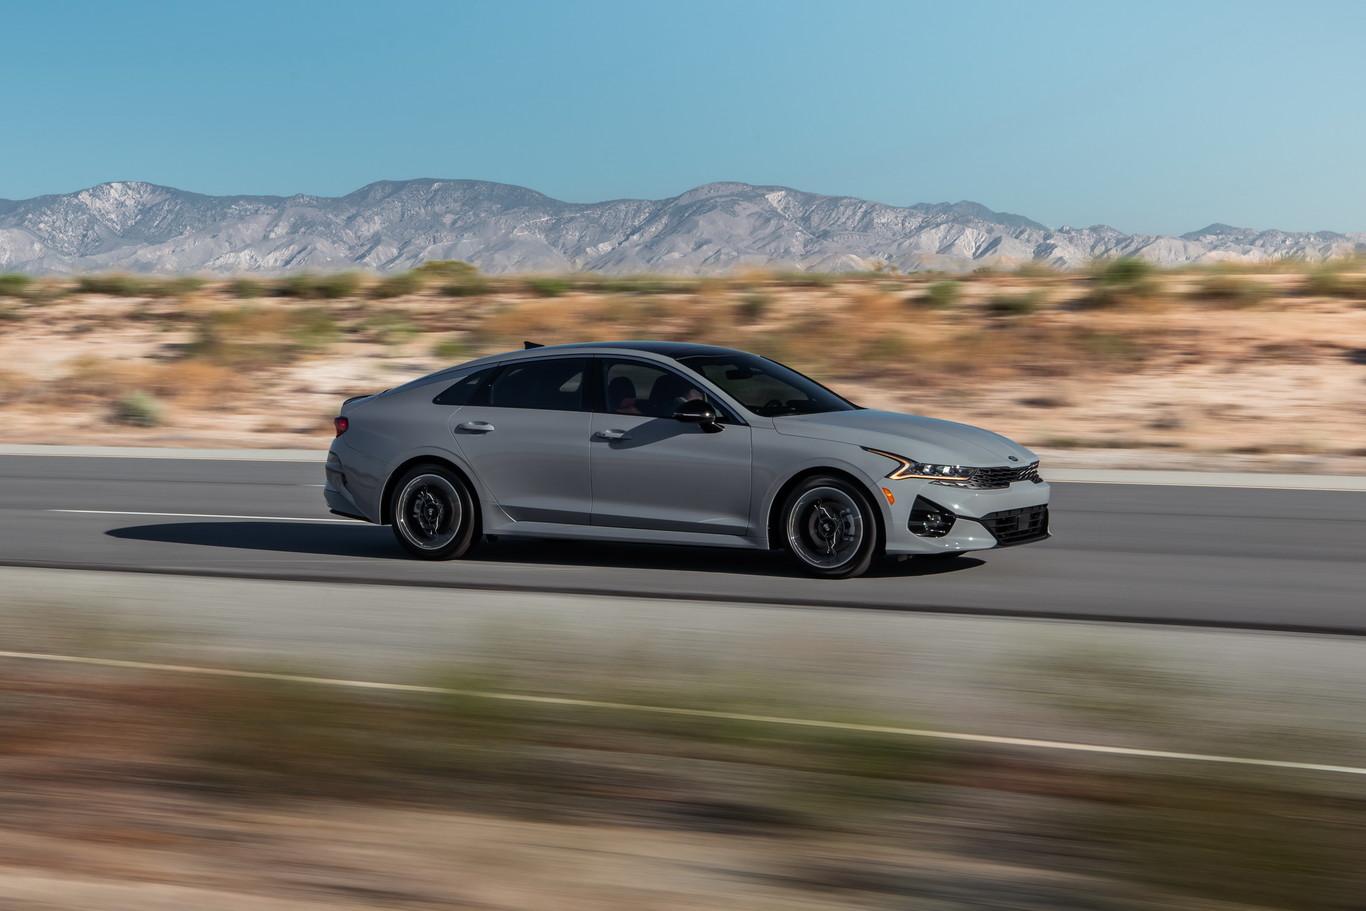 2021 Kia Gt Coupe Spesification